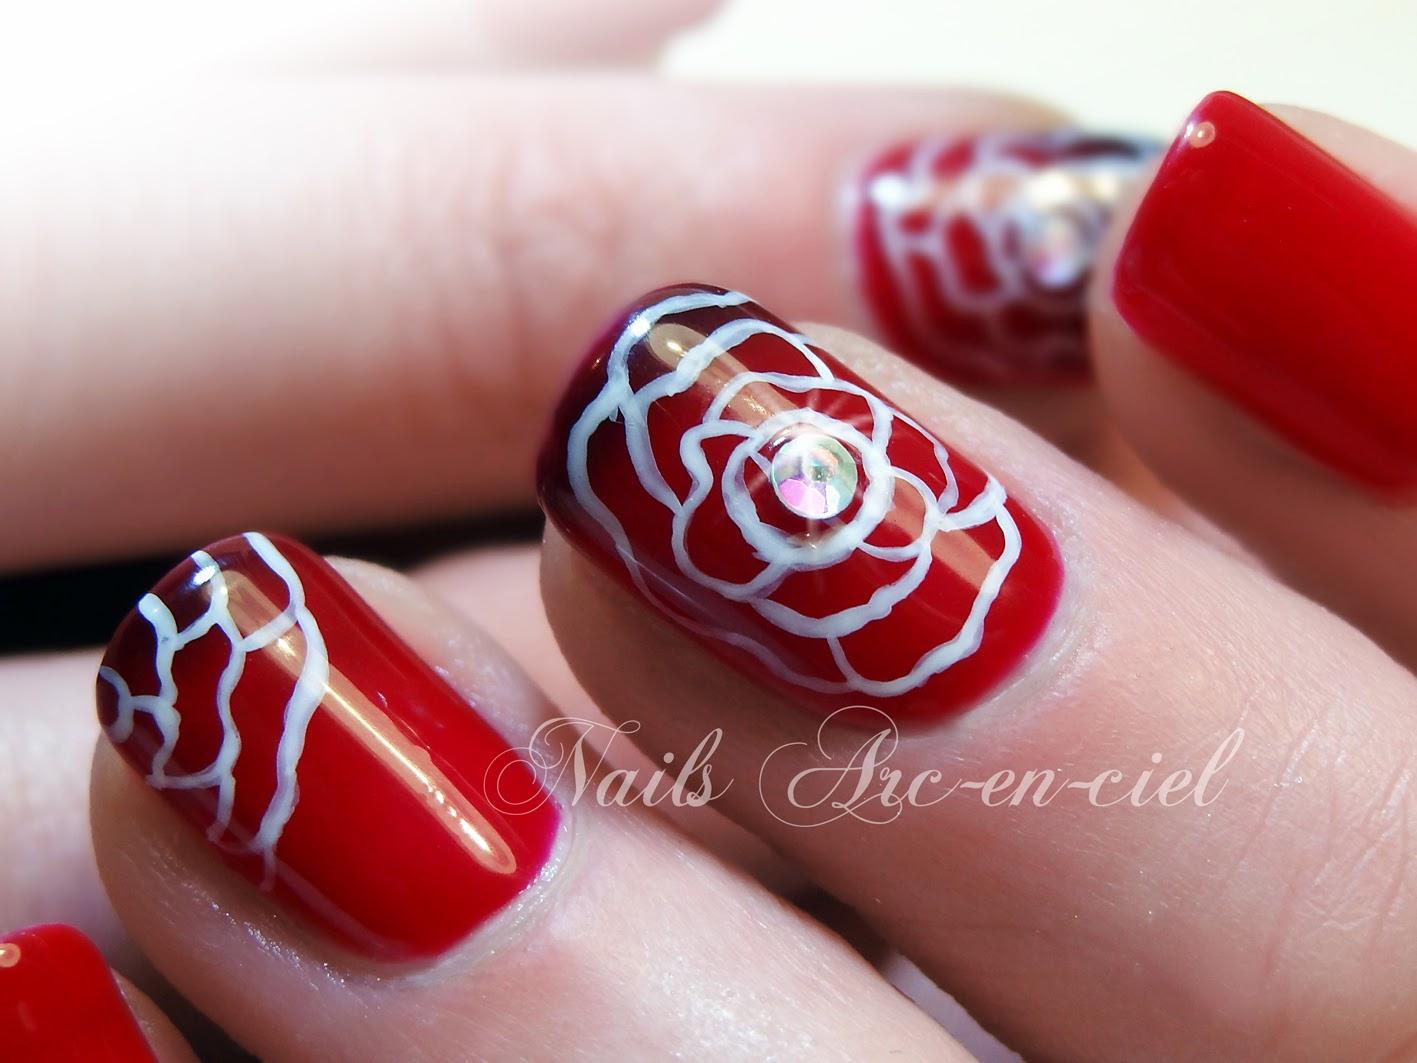 nail art fleur vernis thermosensible Lechat